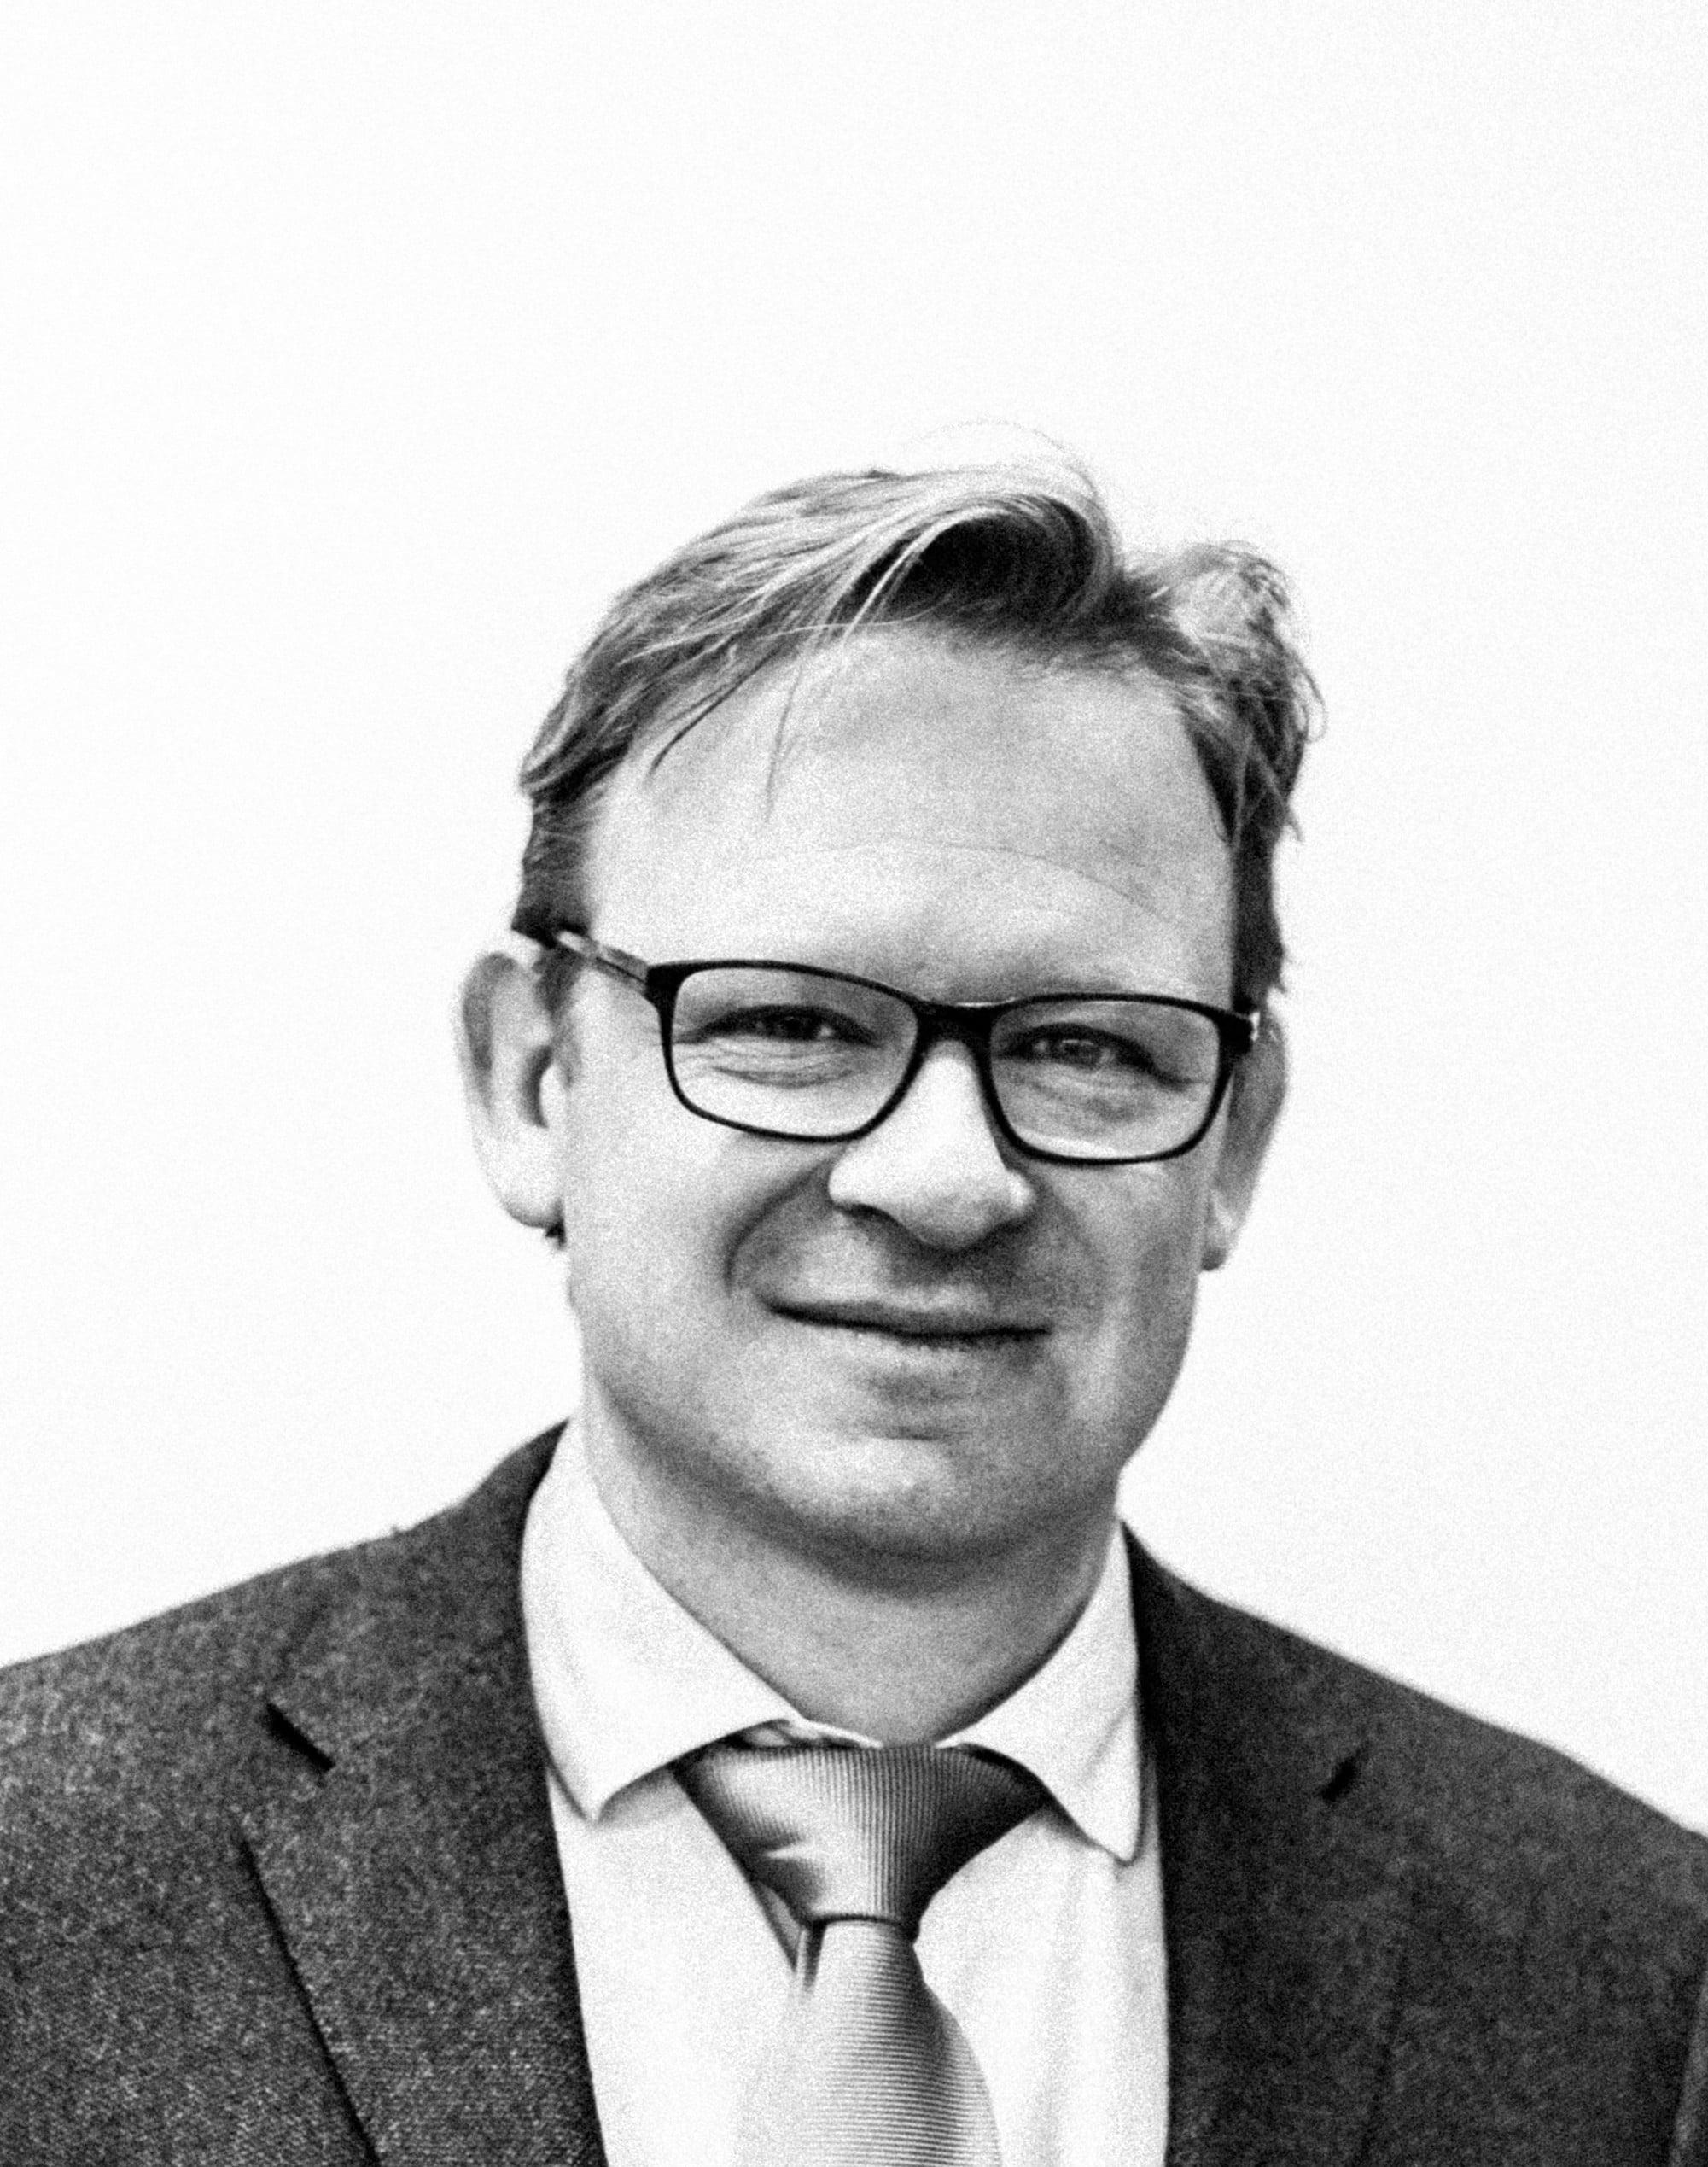 Pieter Lefere